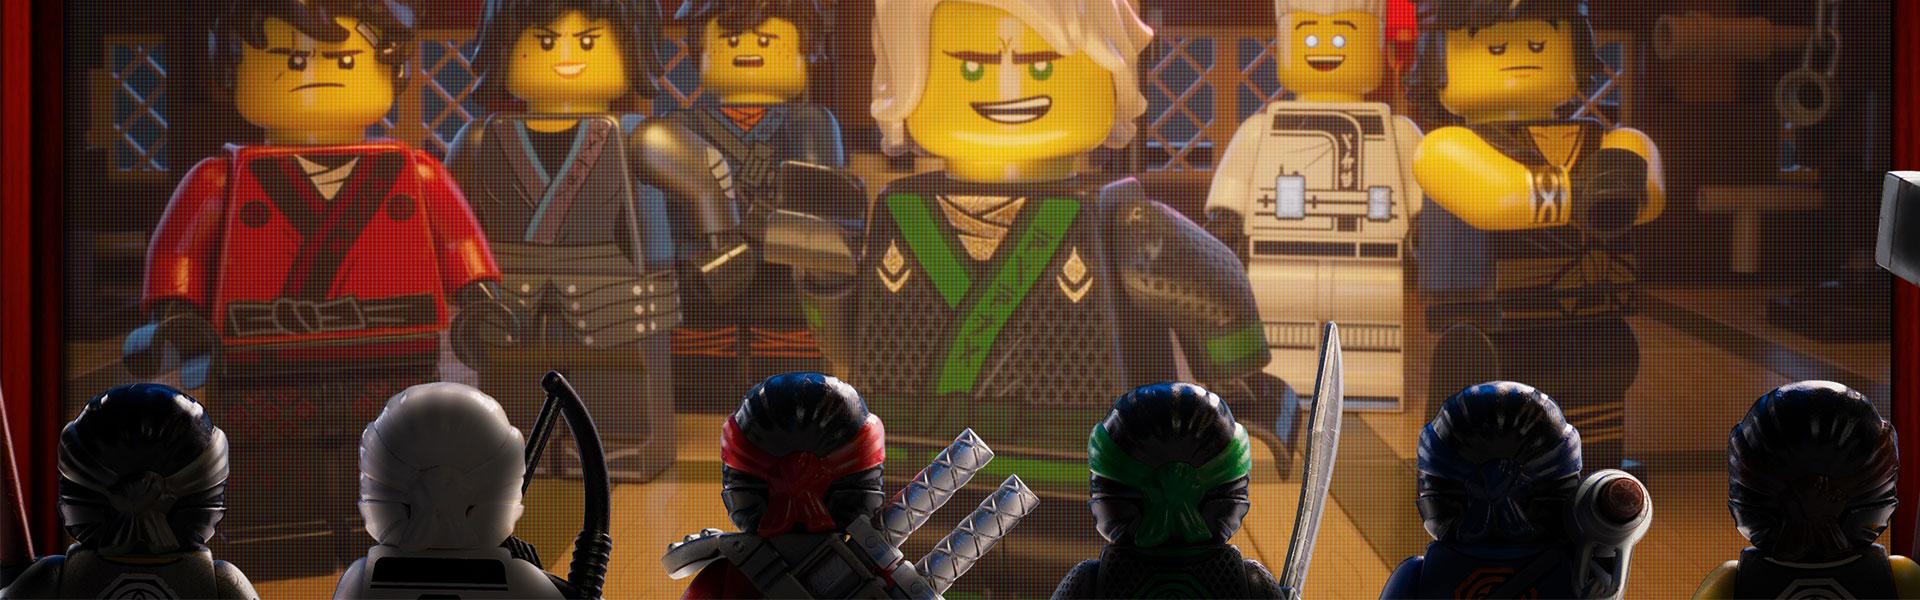 LEGO Ninjago: Film <span>(dubbing)</span>